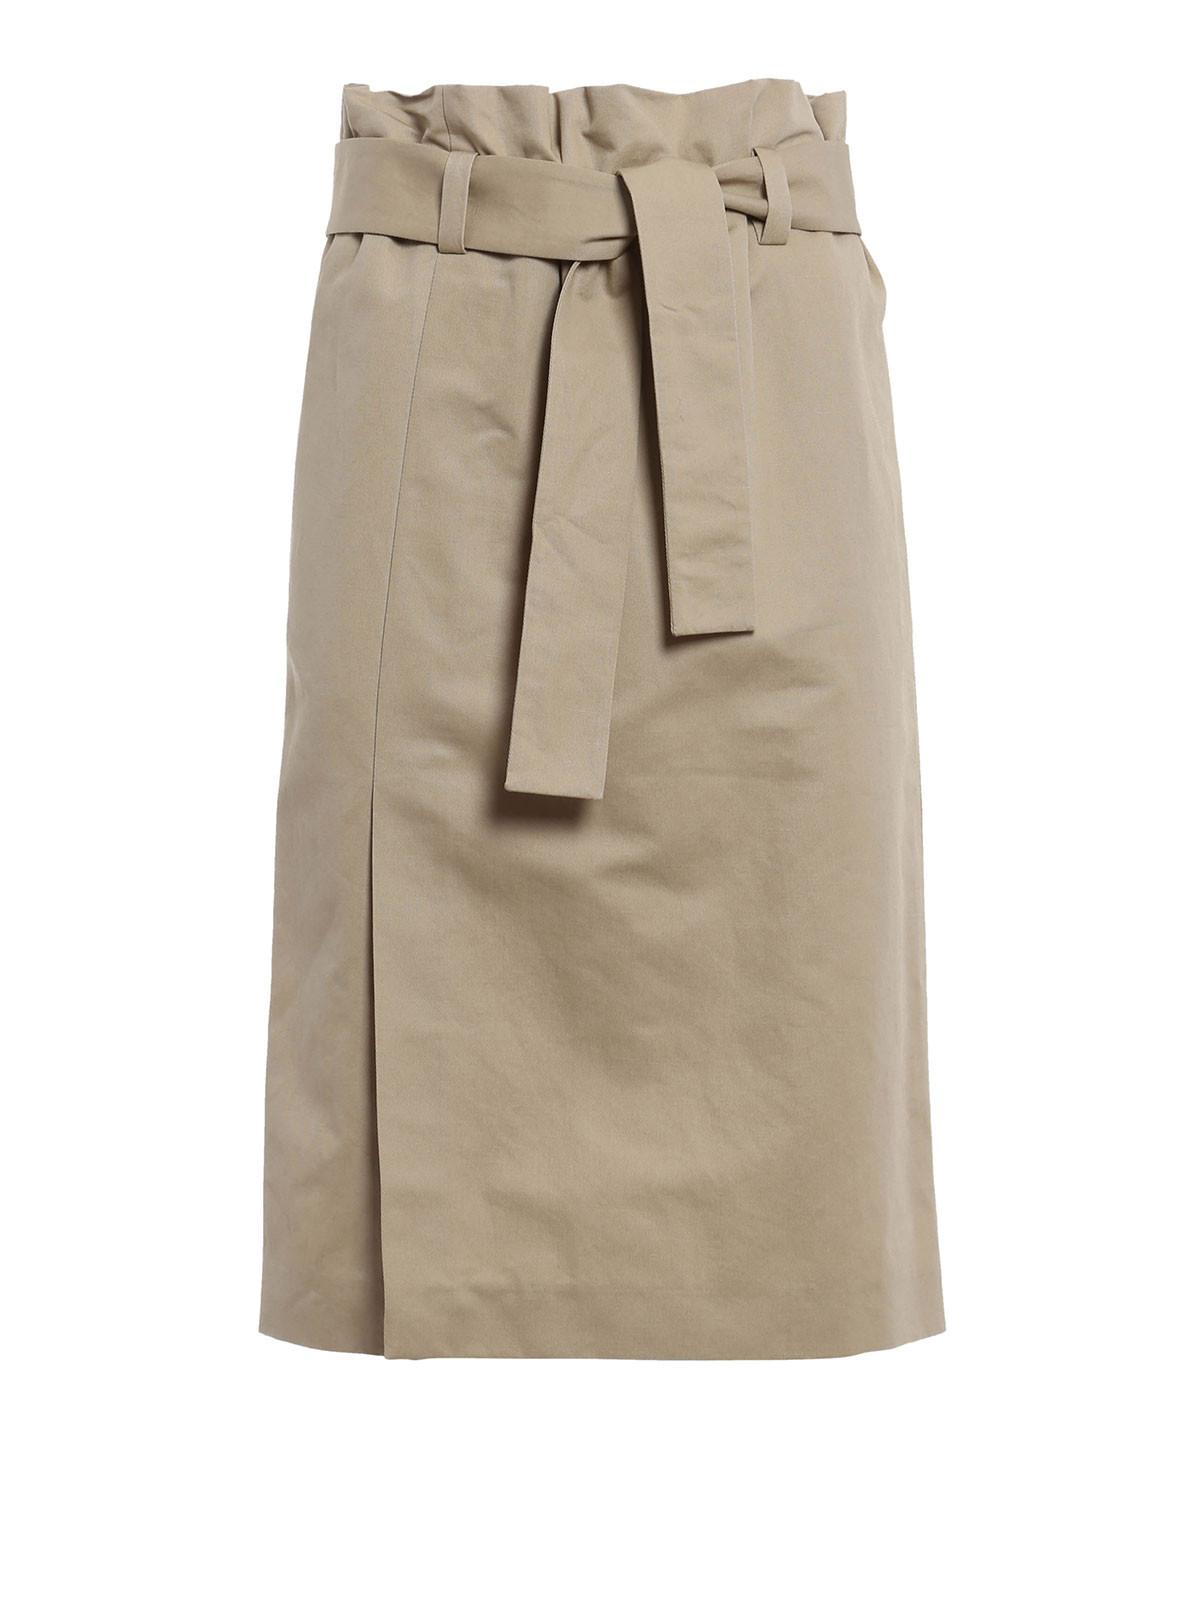 أنواع قماش الجيبات - موديلات جيبات جبردين